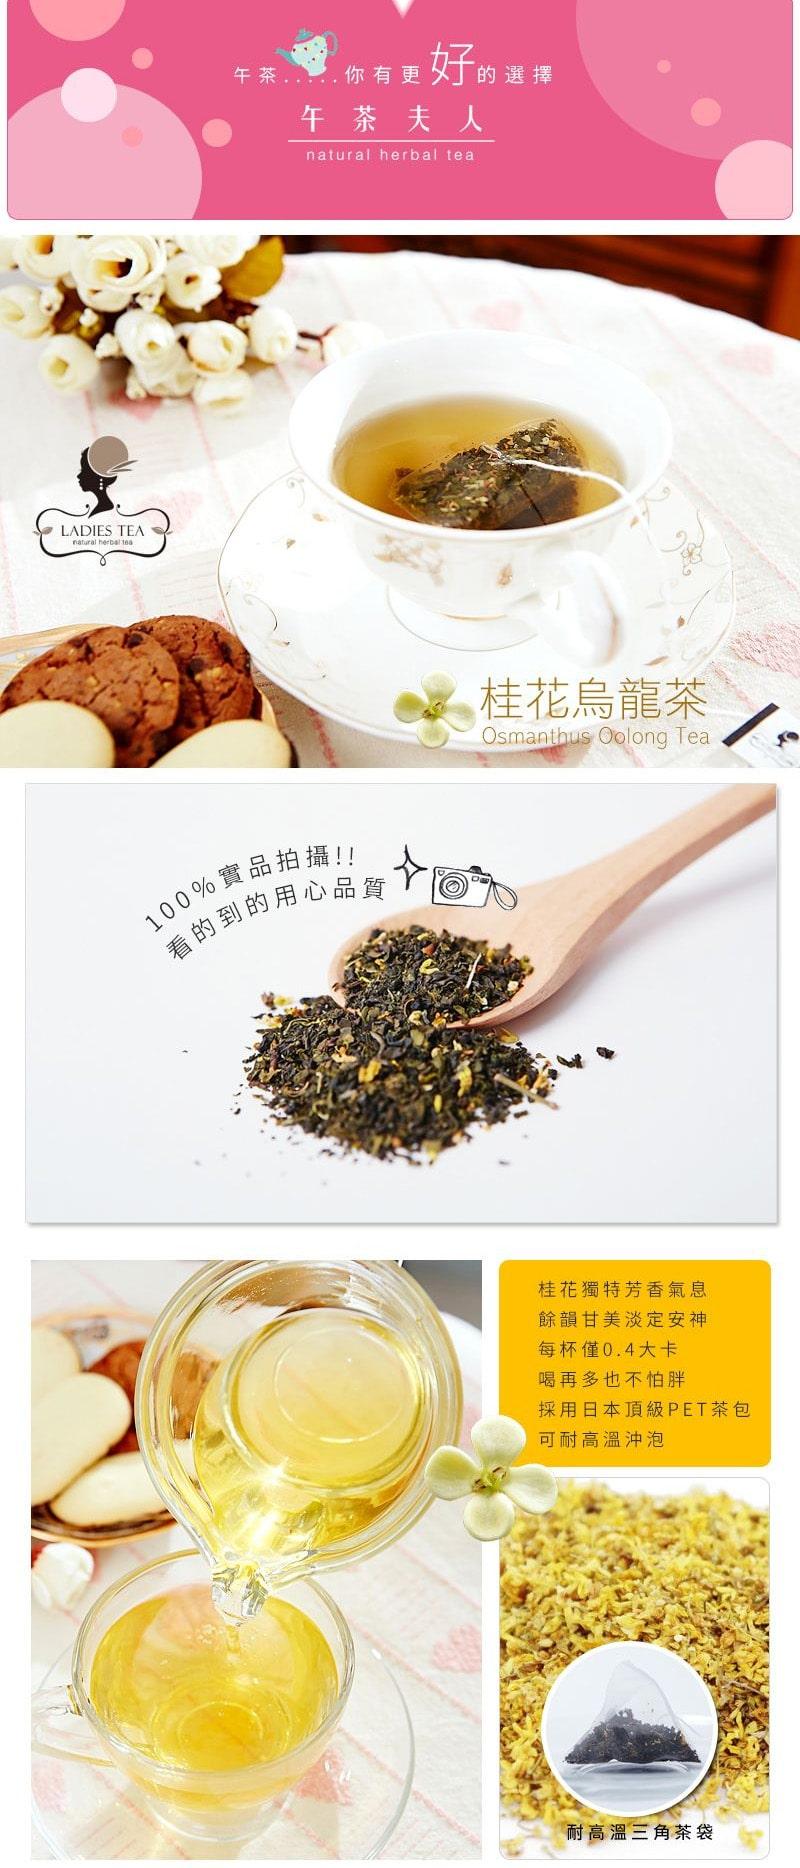 Osmanthus Oolong Tea - Intro